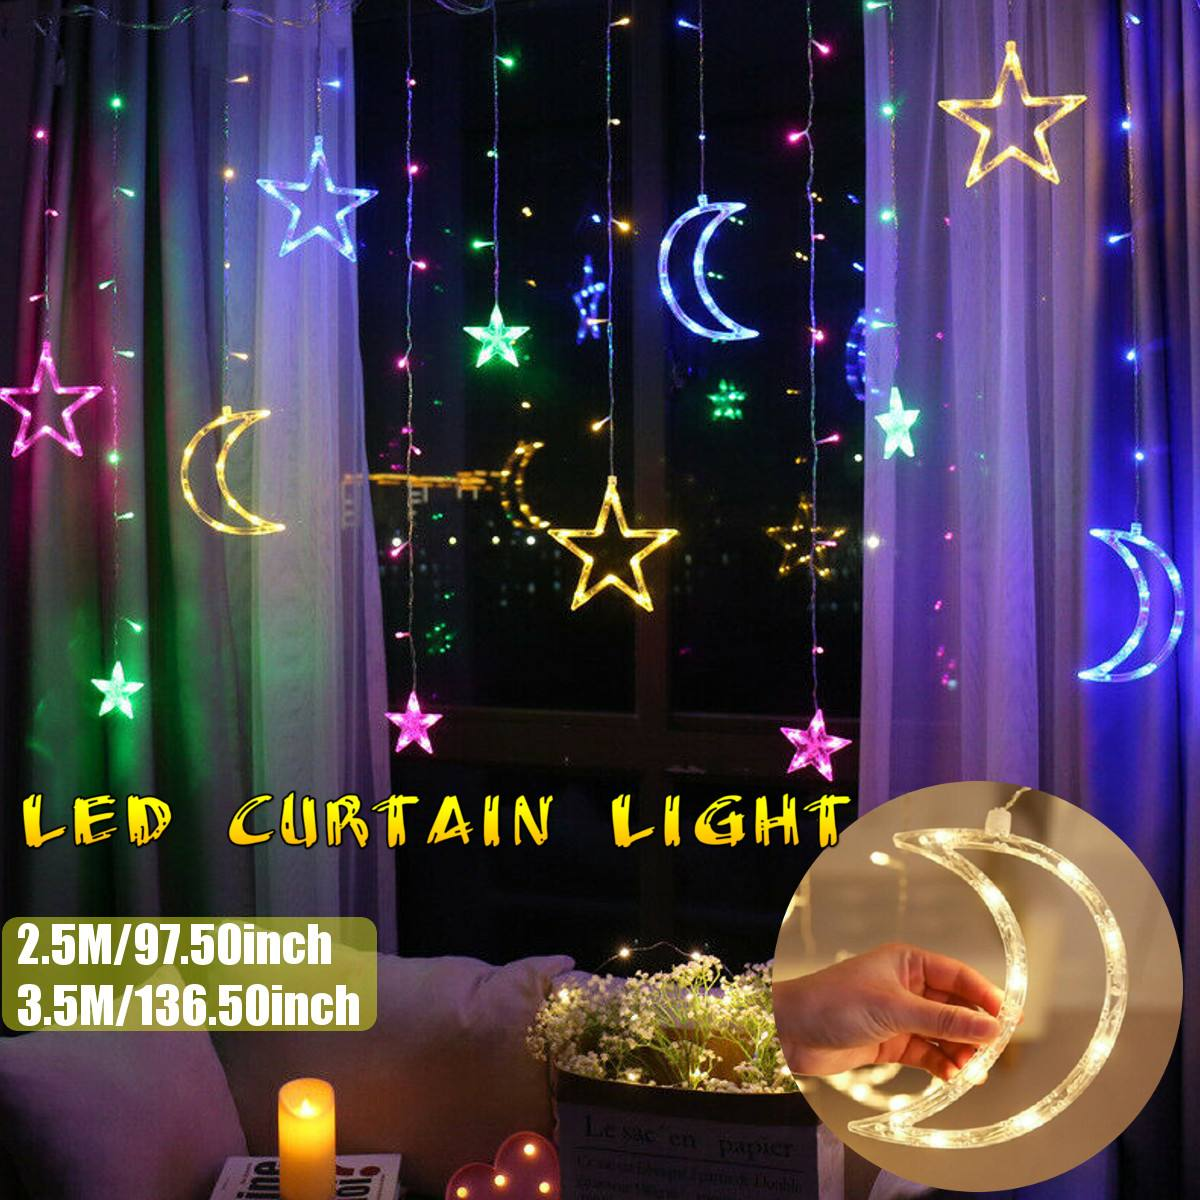 2.5/3.5m LED String Lights Pentagram Star Curtain Light Fairy Wedding Birthday Christmas Lighting Indoor Decoration Light 220V